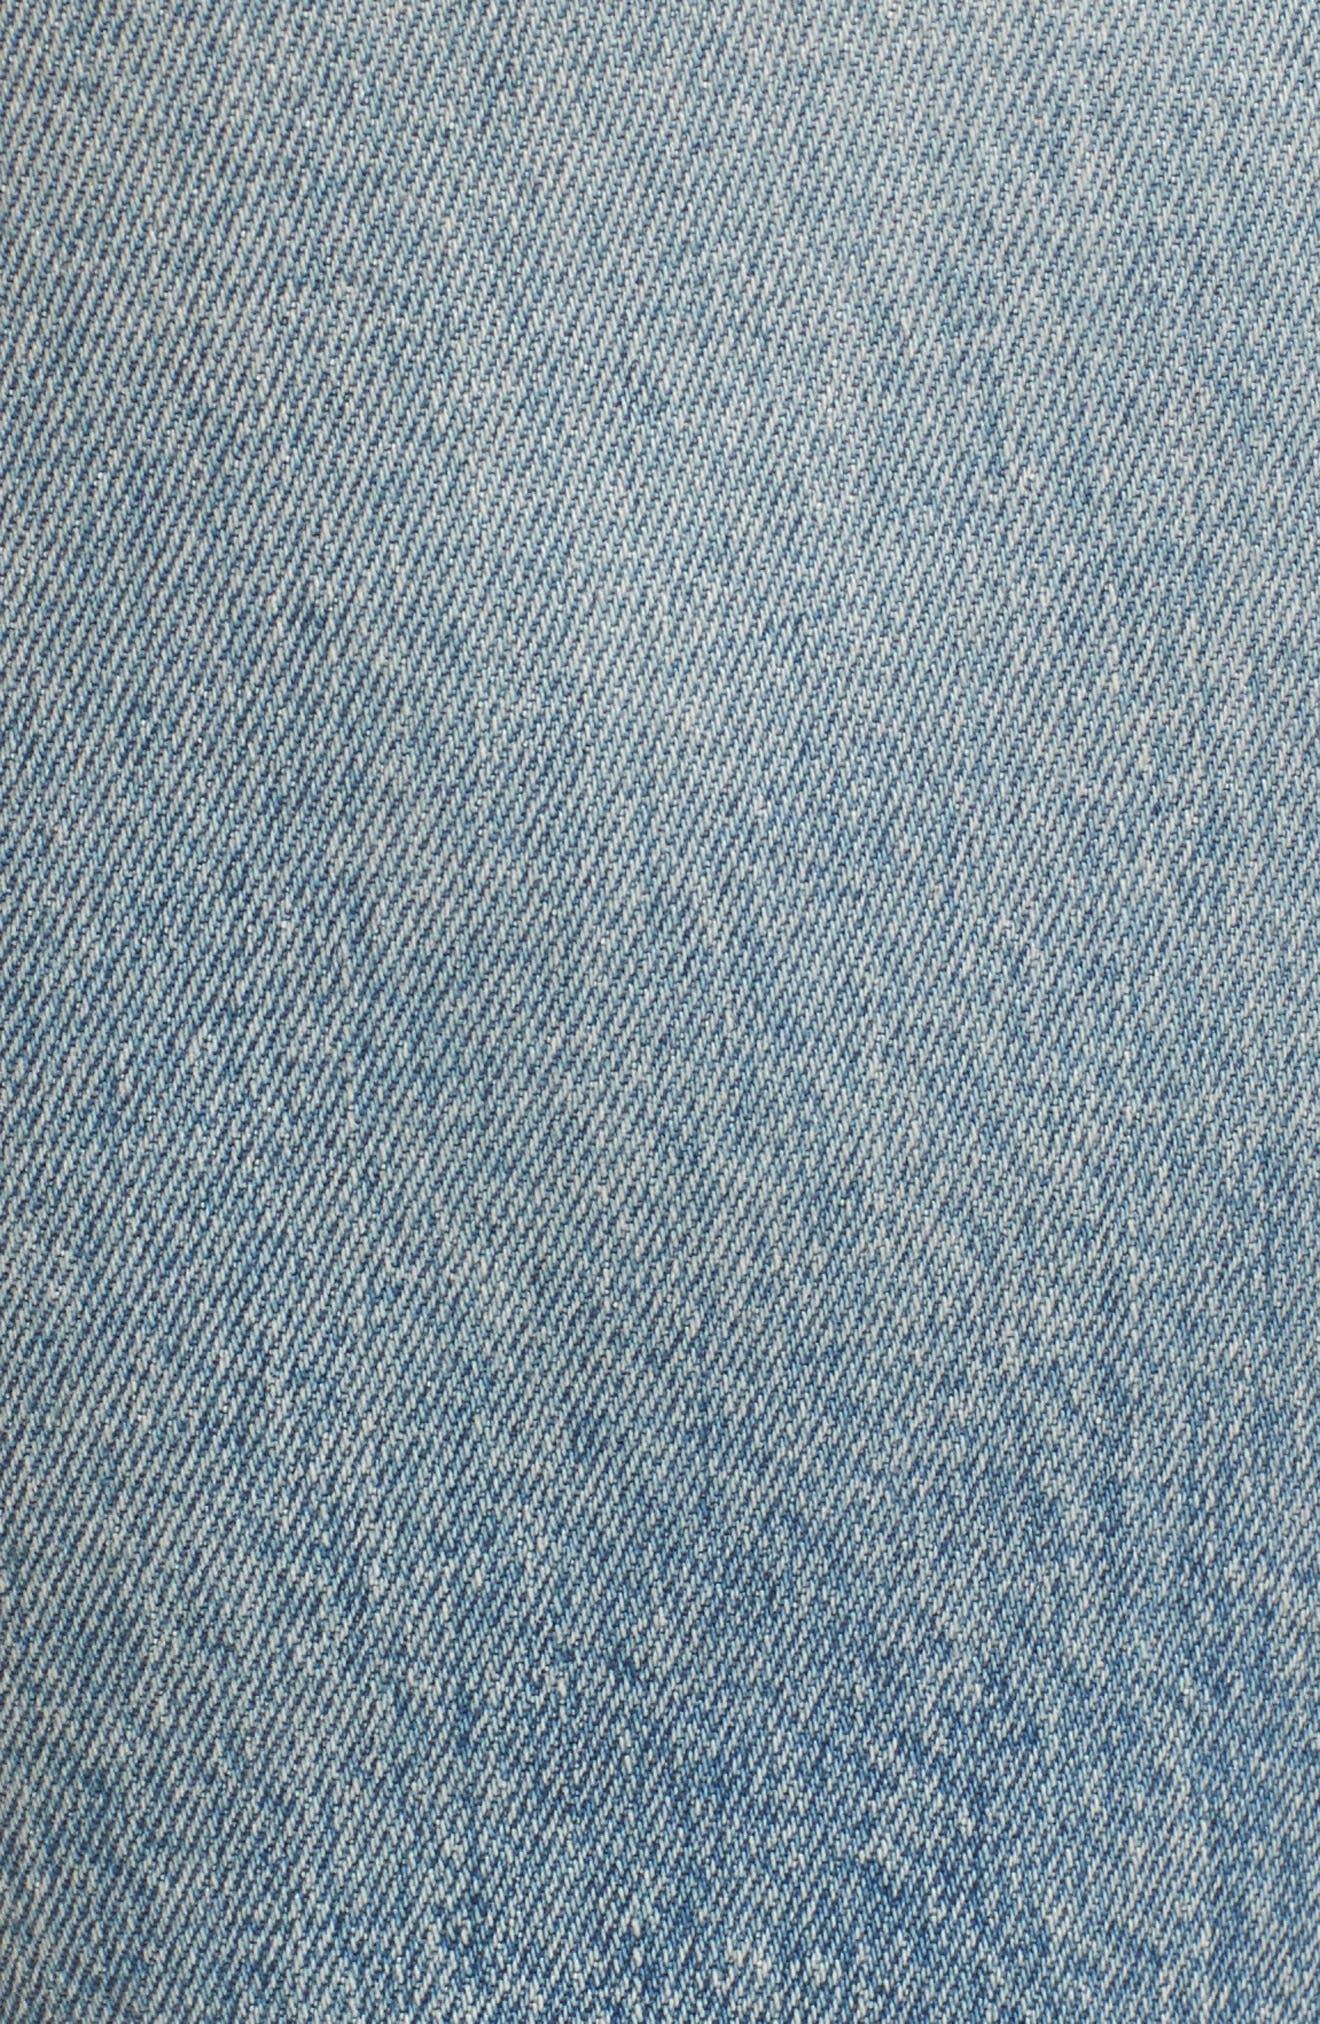 Alternate Image 5  - R13 Boy Clean Jeans (Leyton)